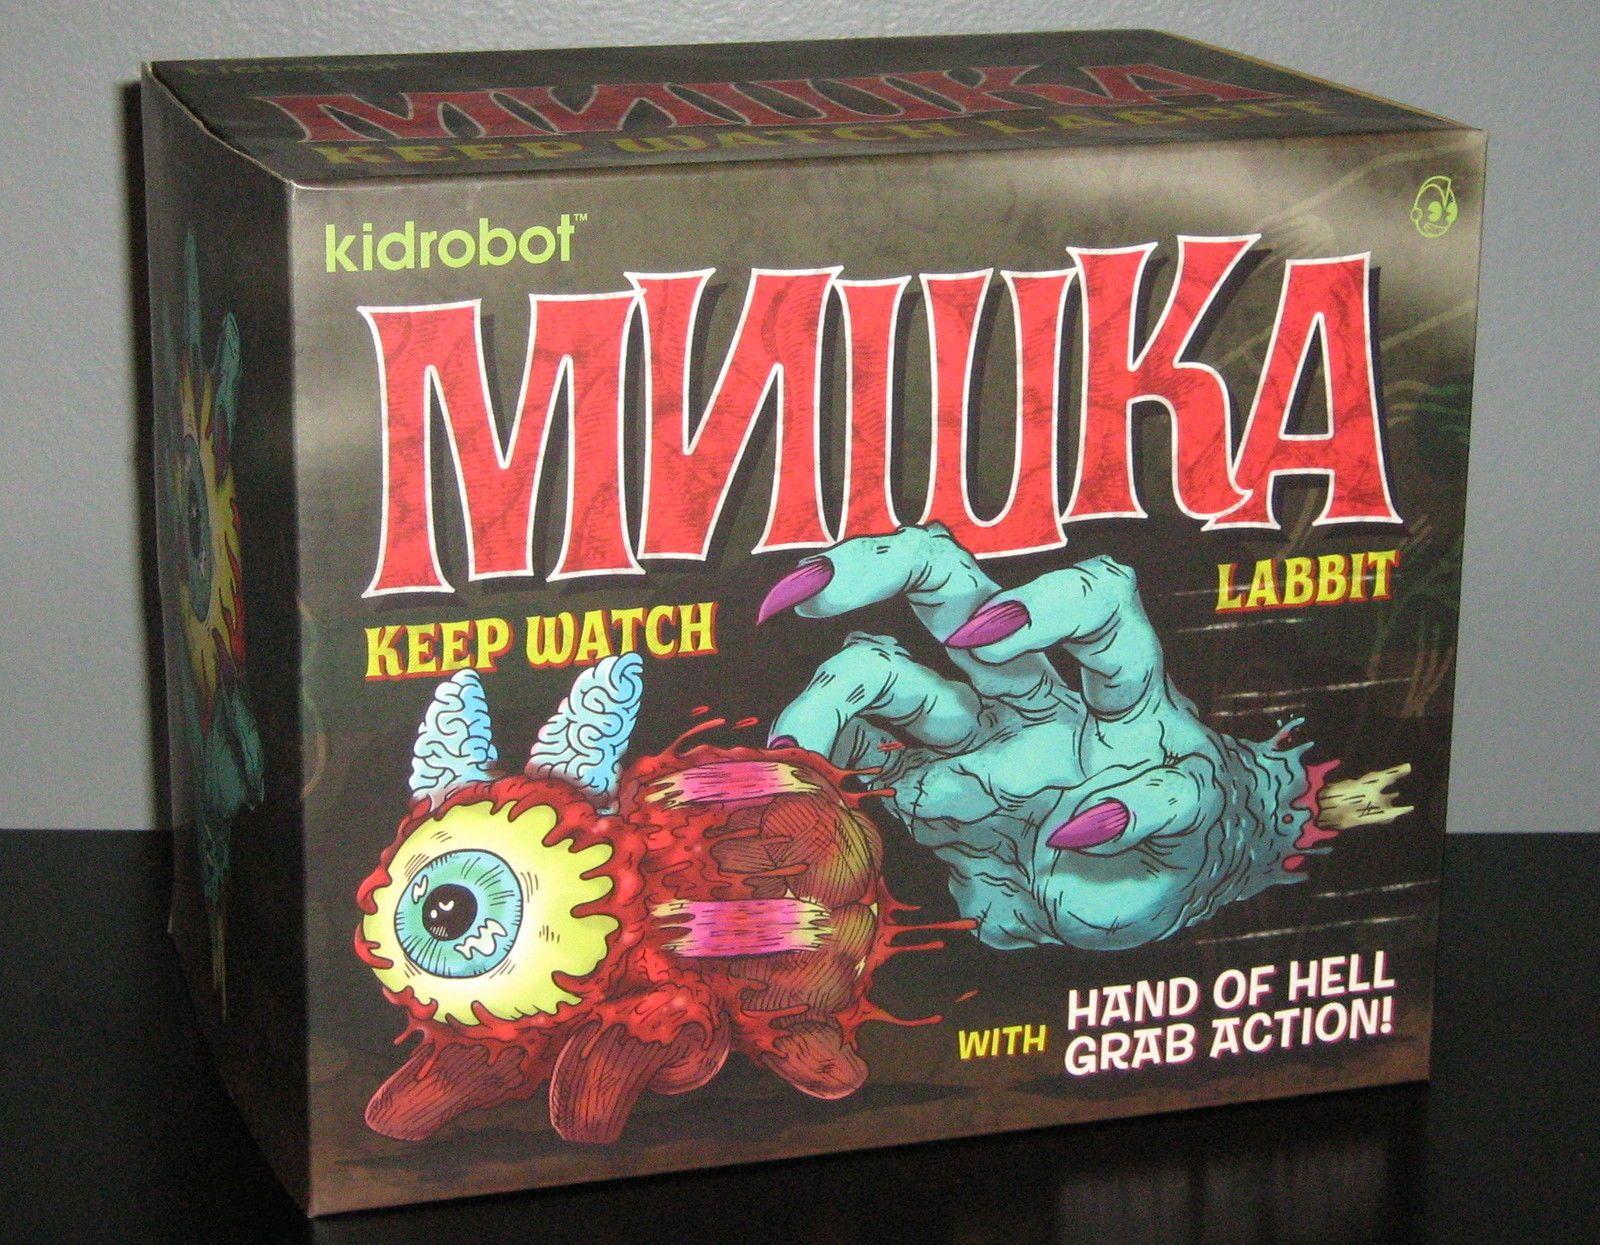 Keep Watch Labbit 10 inch Kidrobot x Mishka NYC Blue GID Hand of Hell | eBay